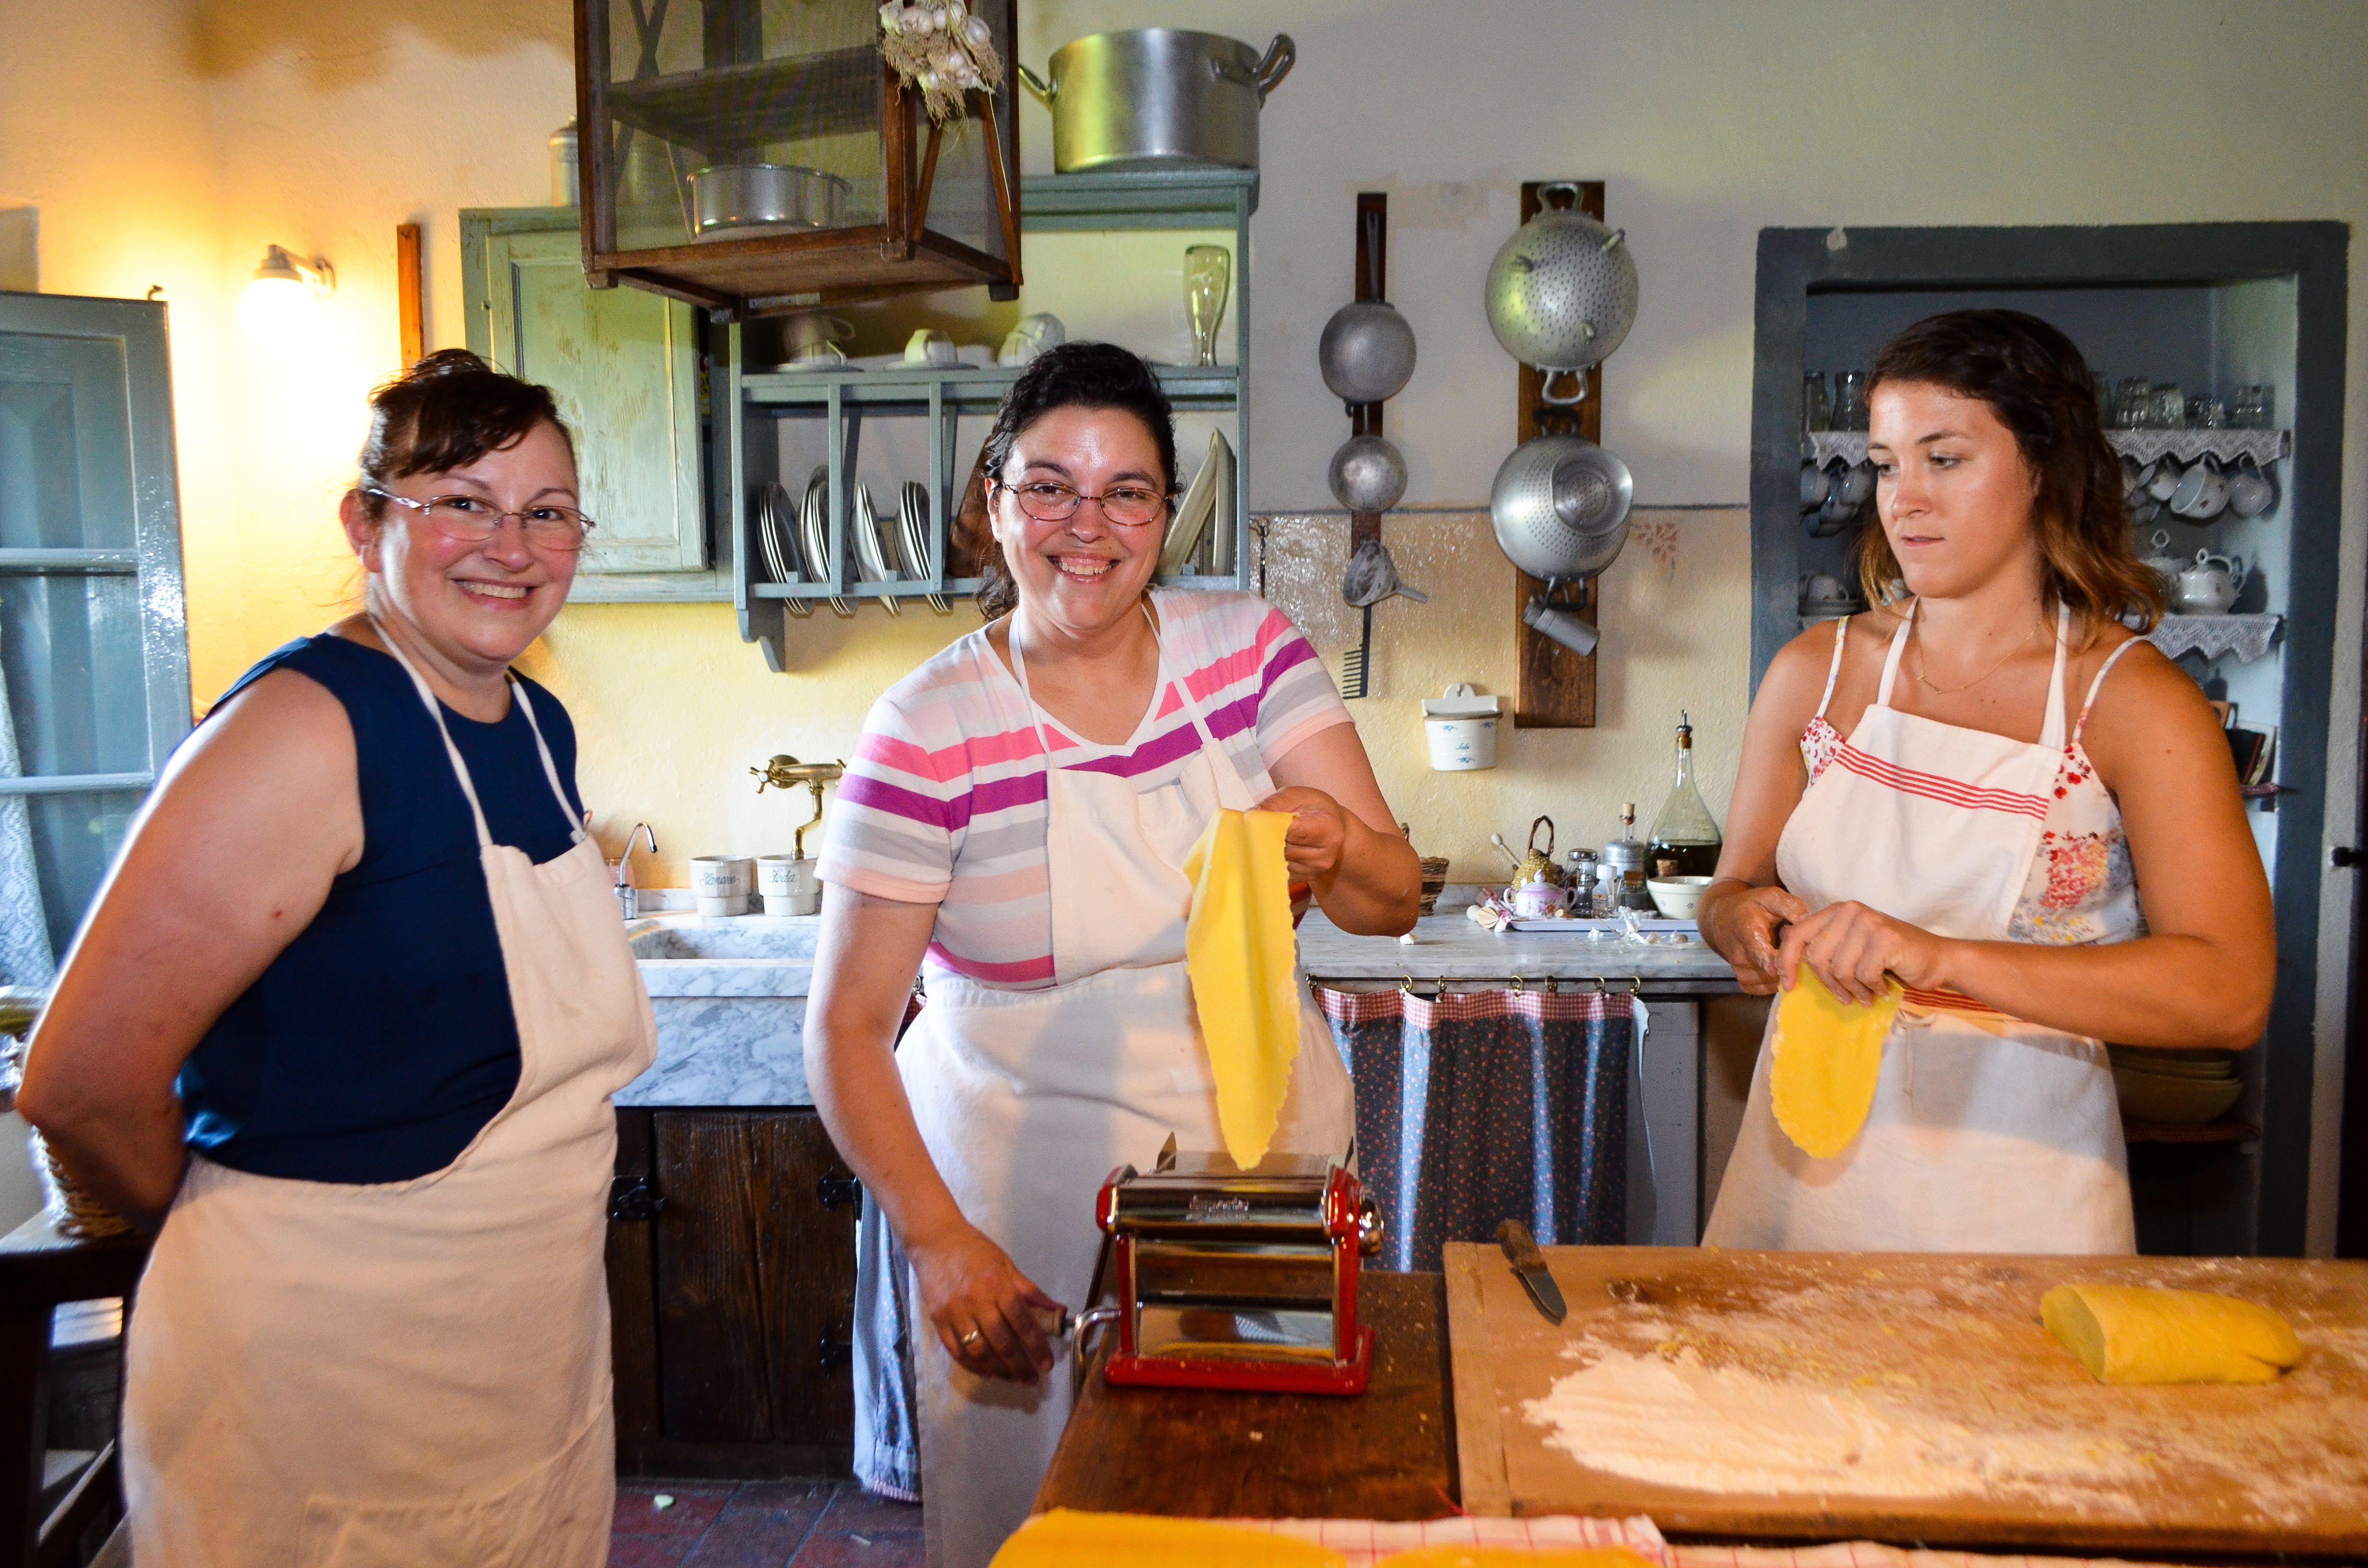 Cooking class #borgoargenina